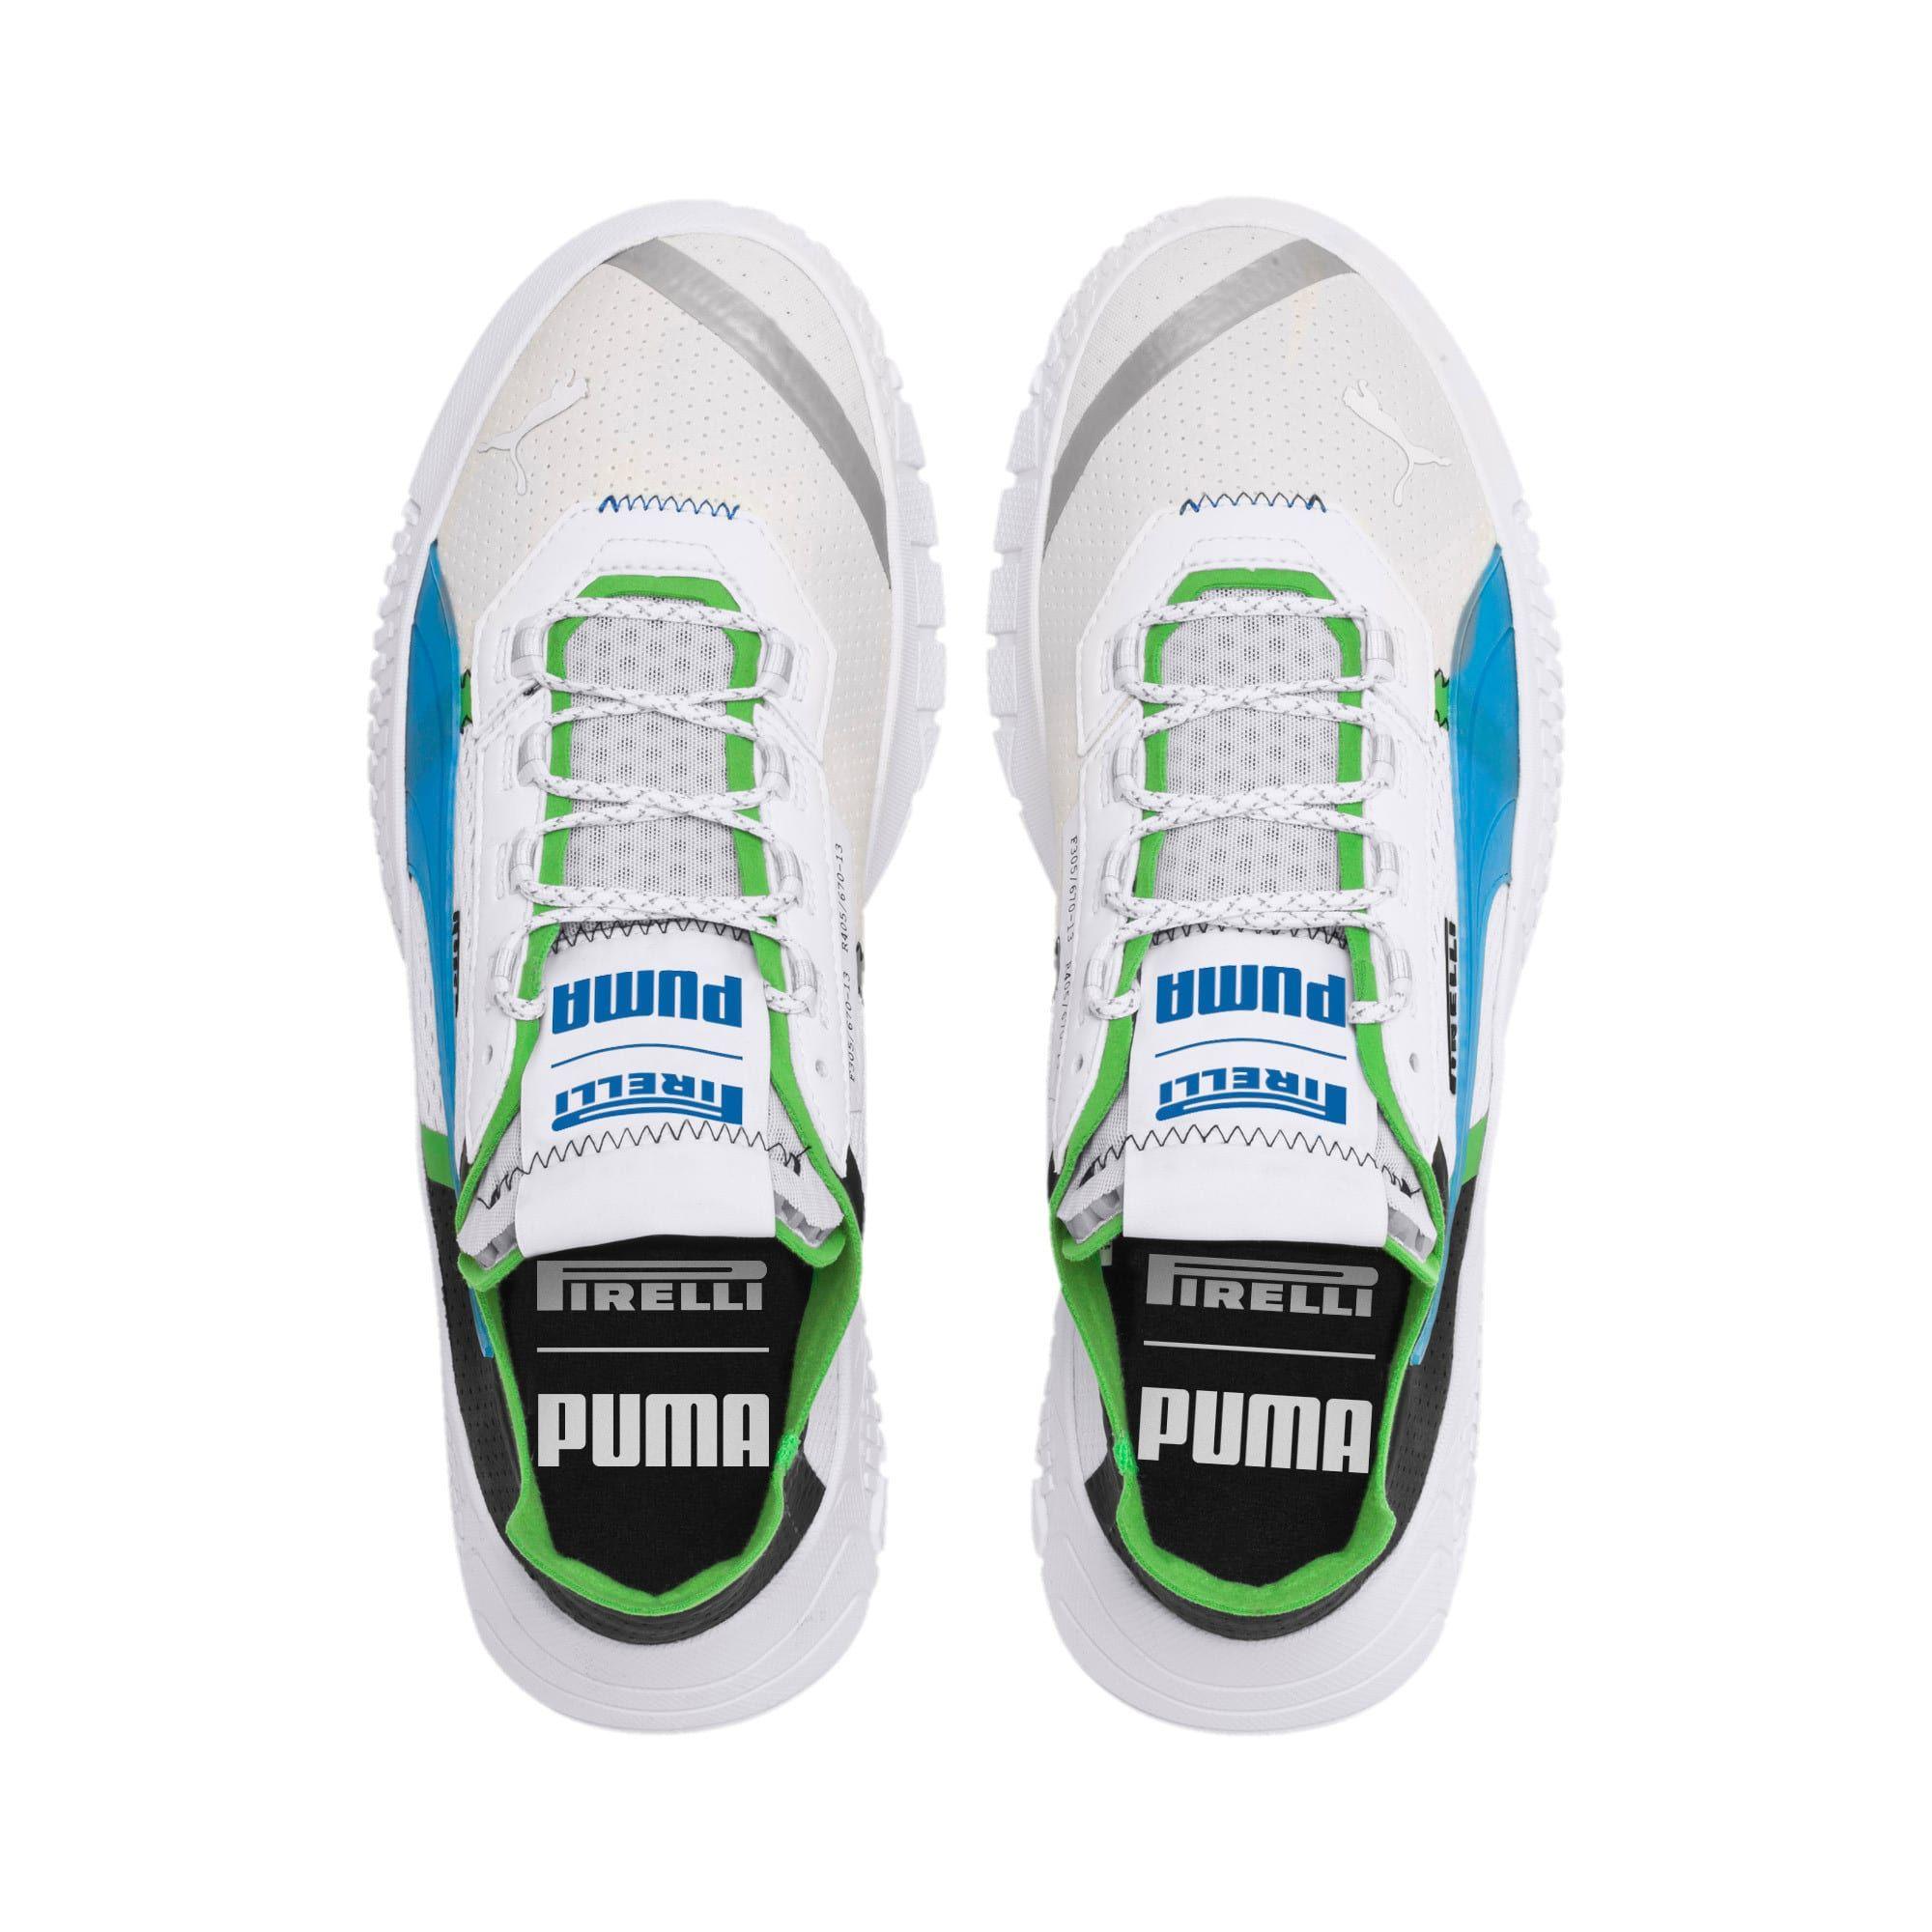 Photo of PUMA Pirelli Replicat-X Trainers,  White/Black/Classic Green, size 10.5, Shoes